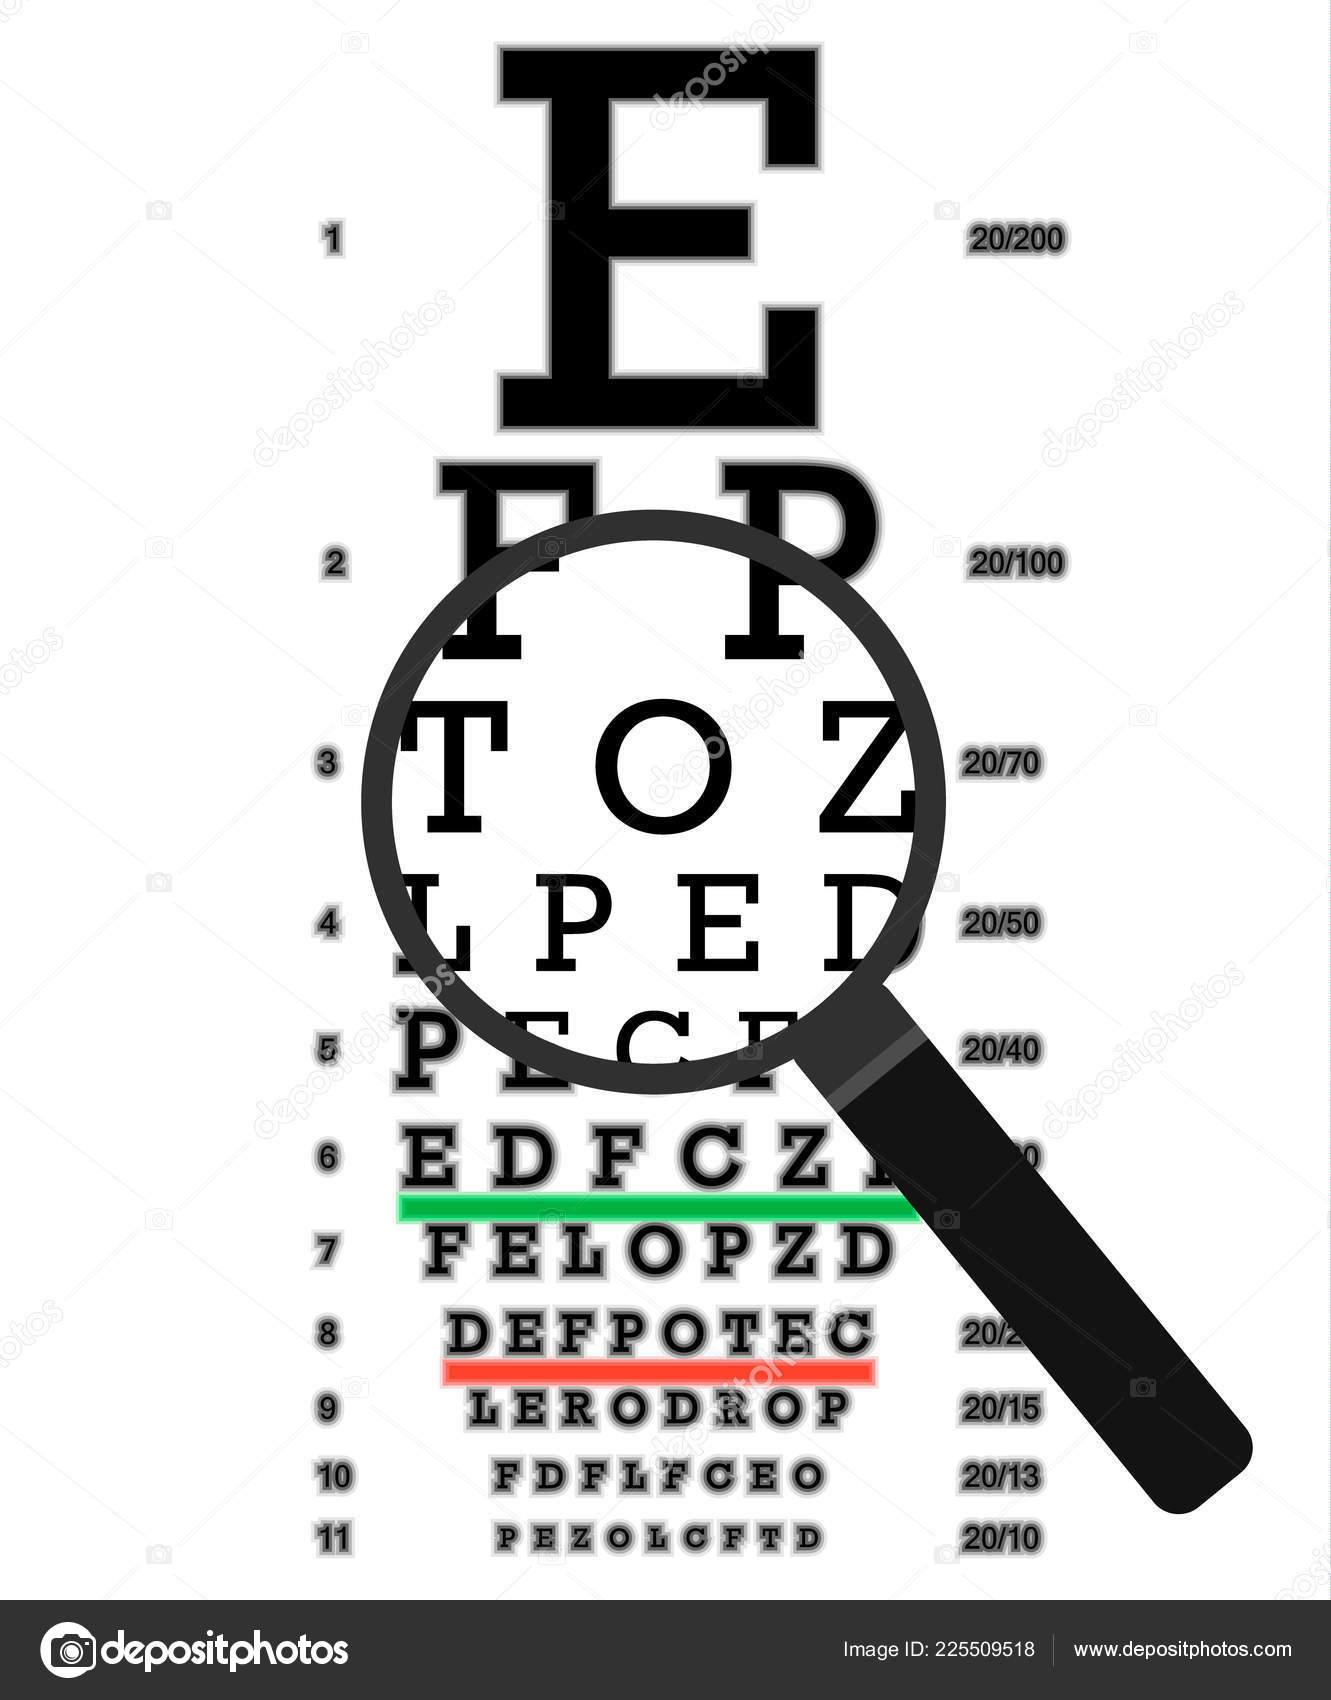 hight resolution of eye vision test poor eyesight myopia diagnostic on snellen eye test chart vision correction